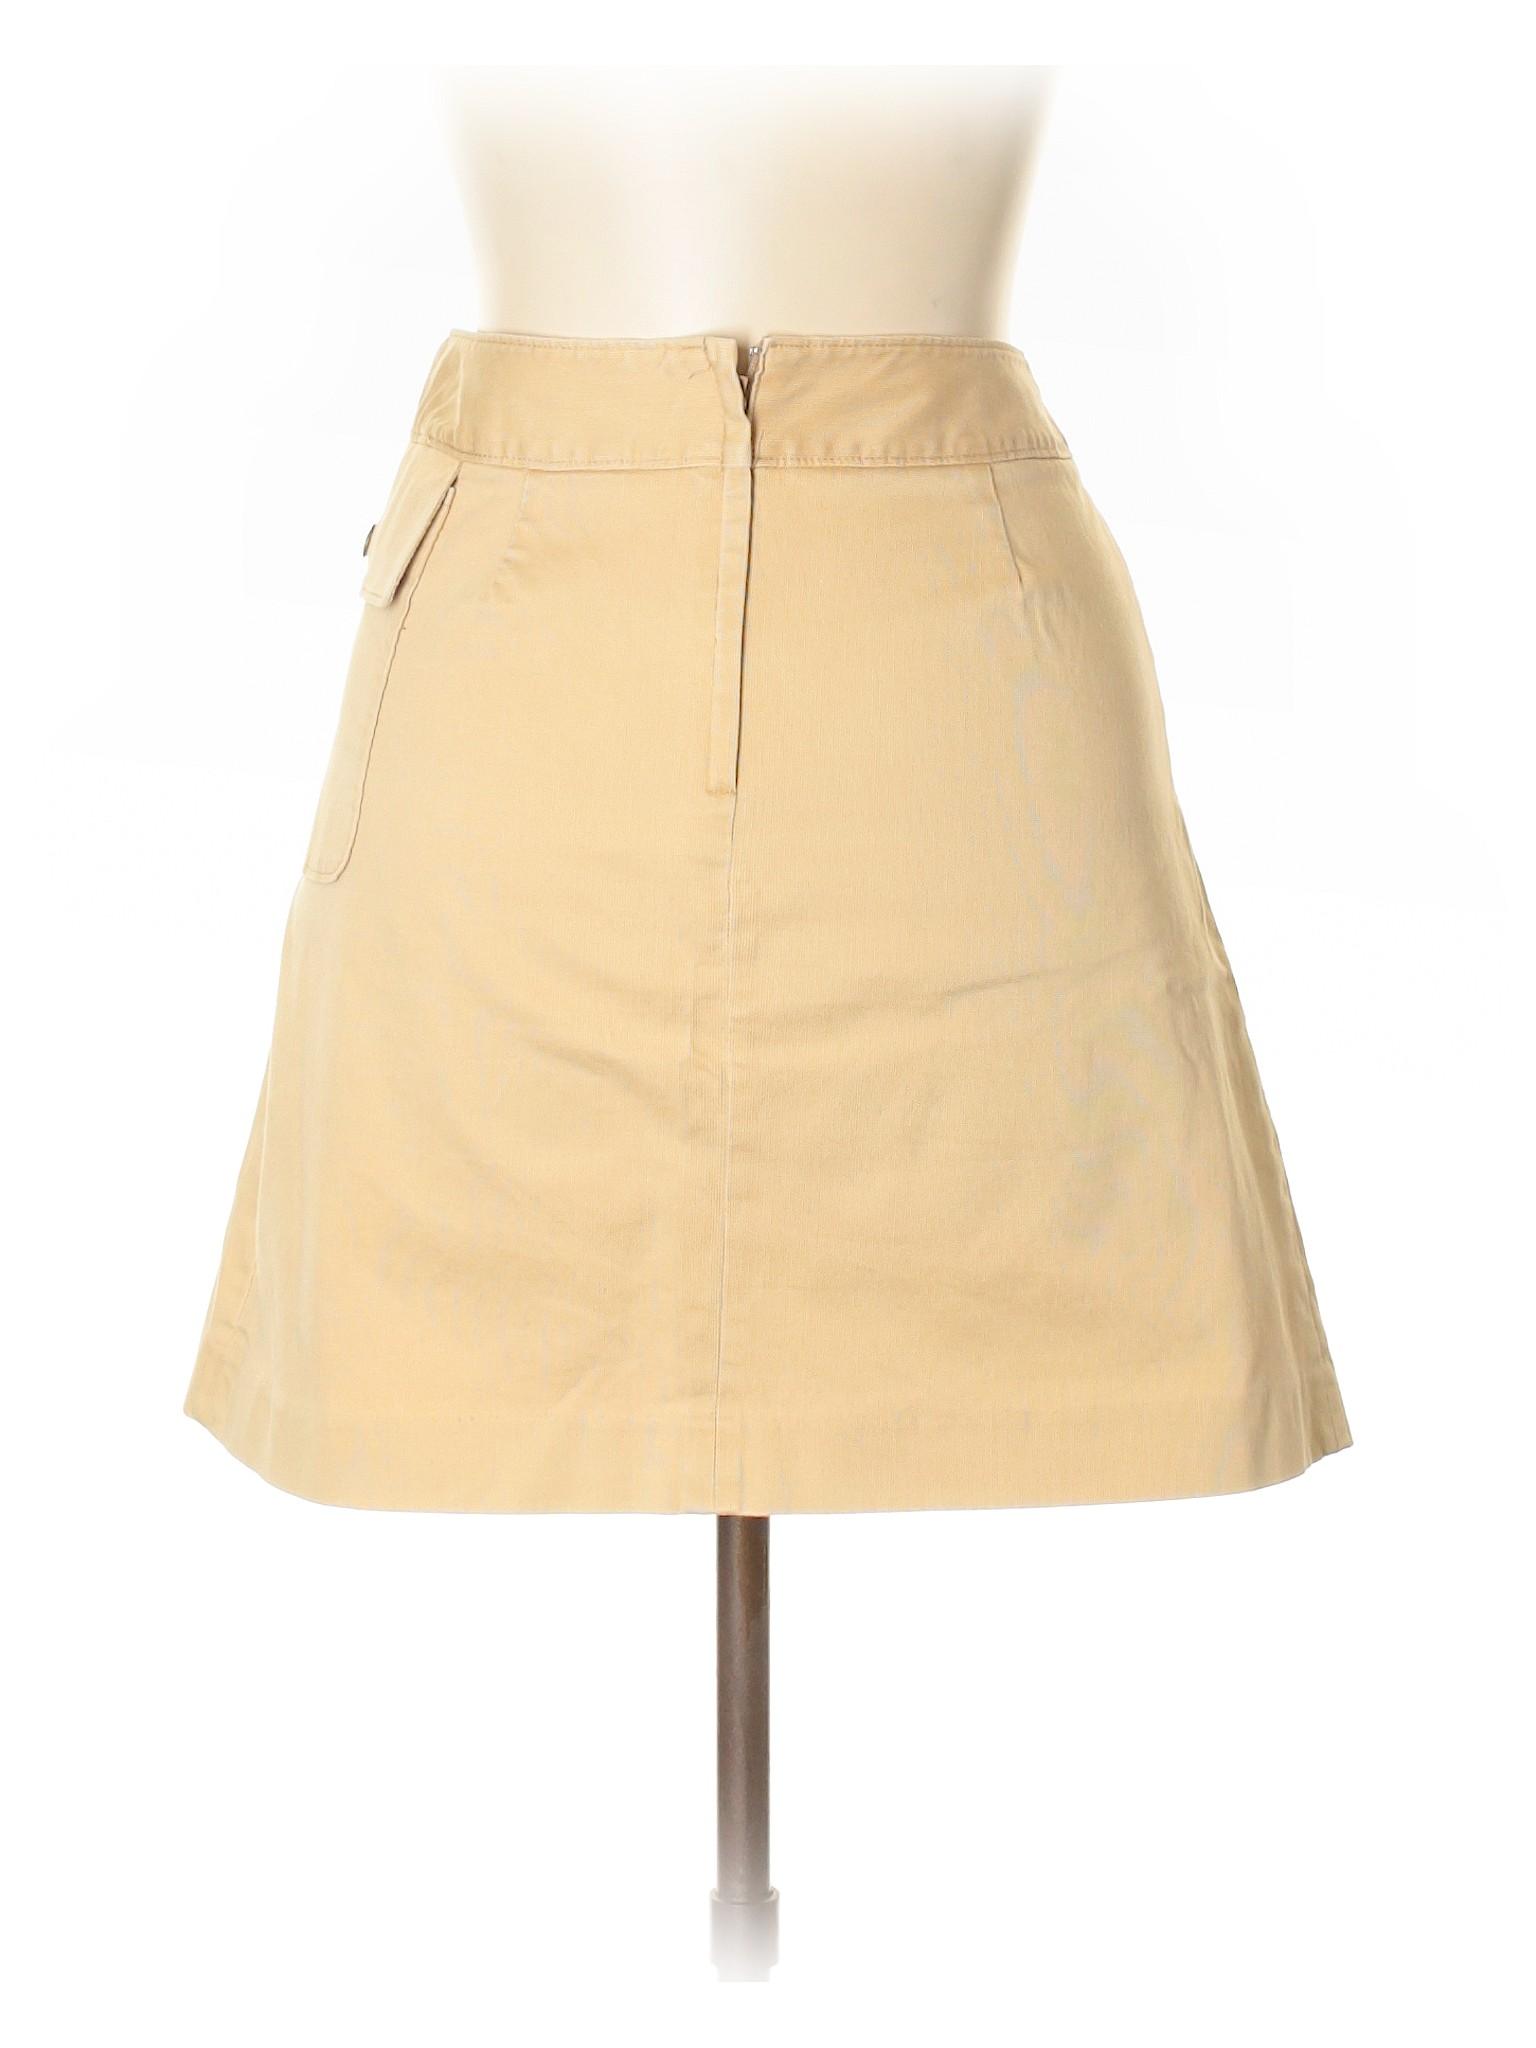 Boutique Skirt Casual Boutique Casual Skirt Casual Casual Boutique Boutique Boutique Skirt Skirt Casual gtEqIg